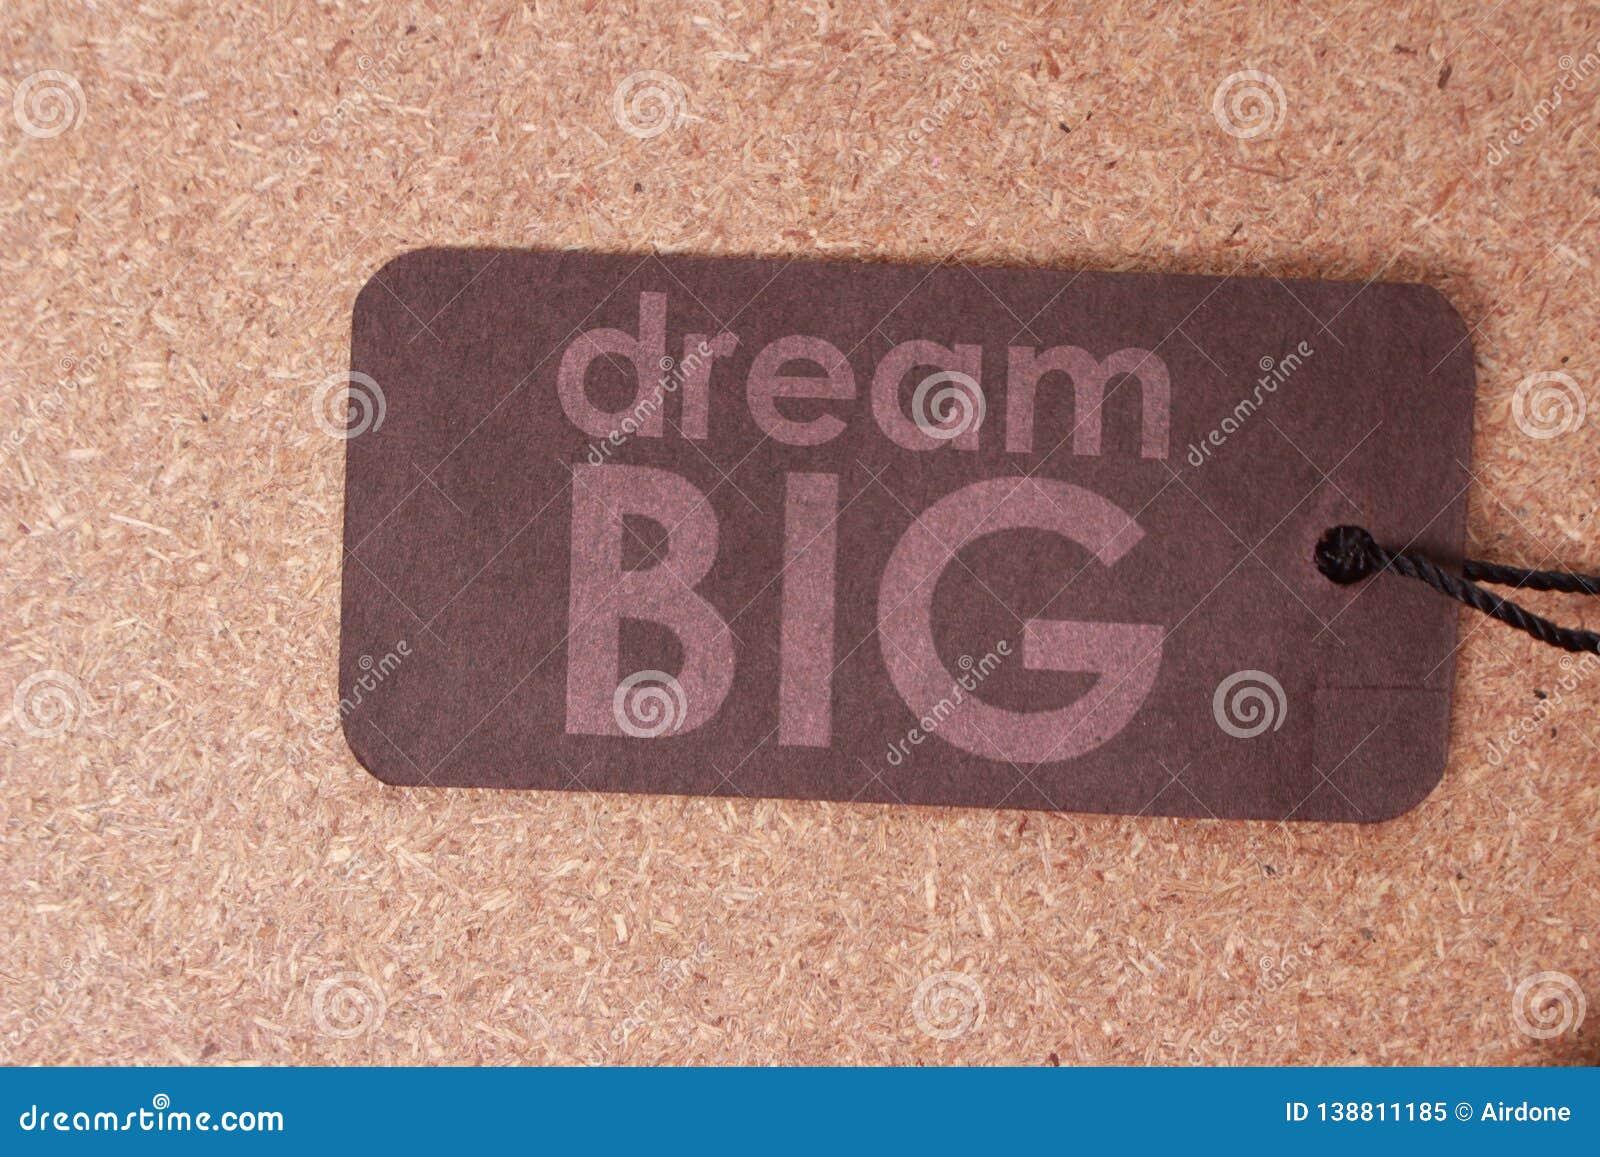 Dream Big, Motivational Business Words Quotes Concept